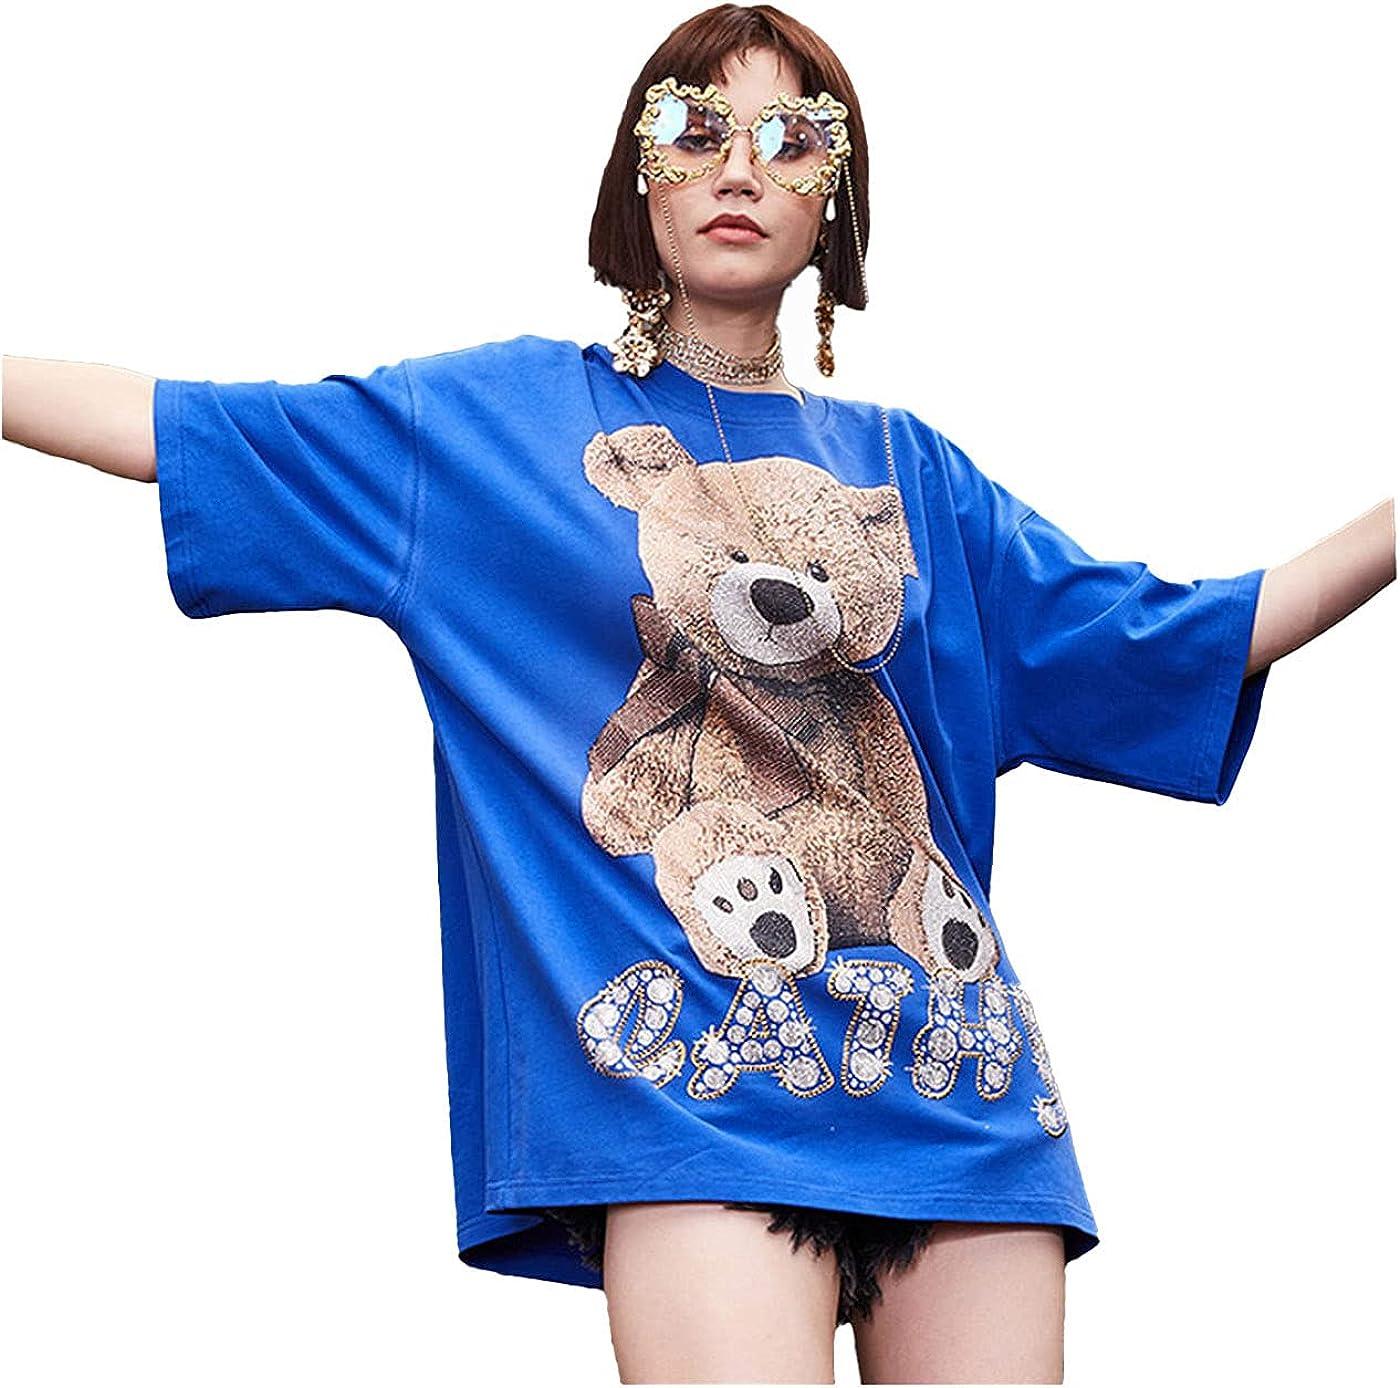 F/F·X Bear Rhinestone Loose Blue Short T-Shirt